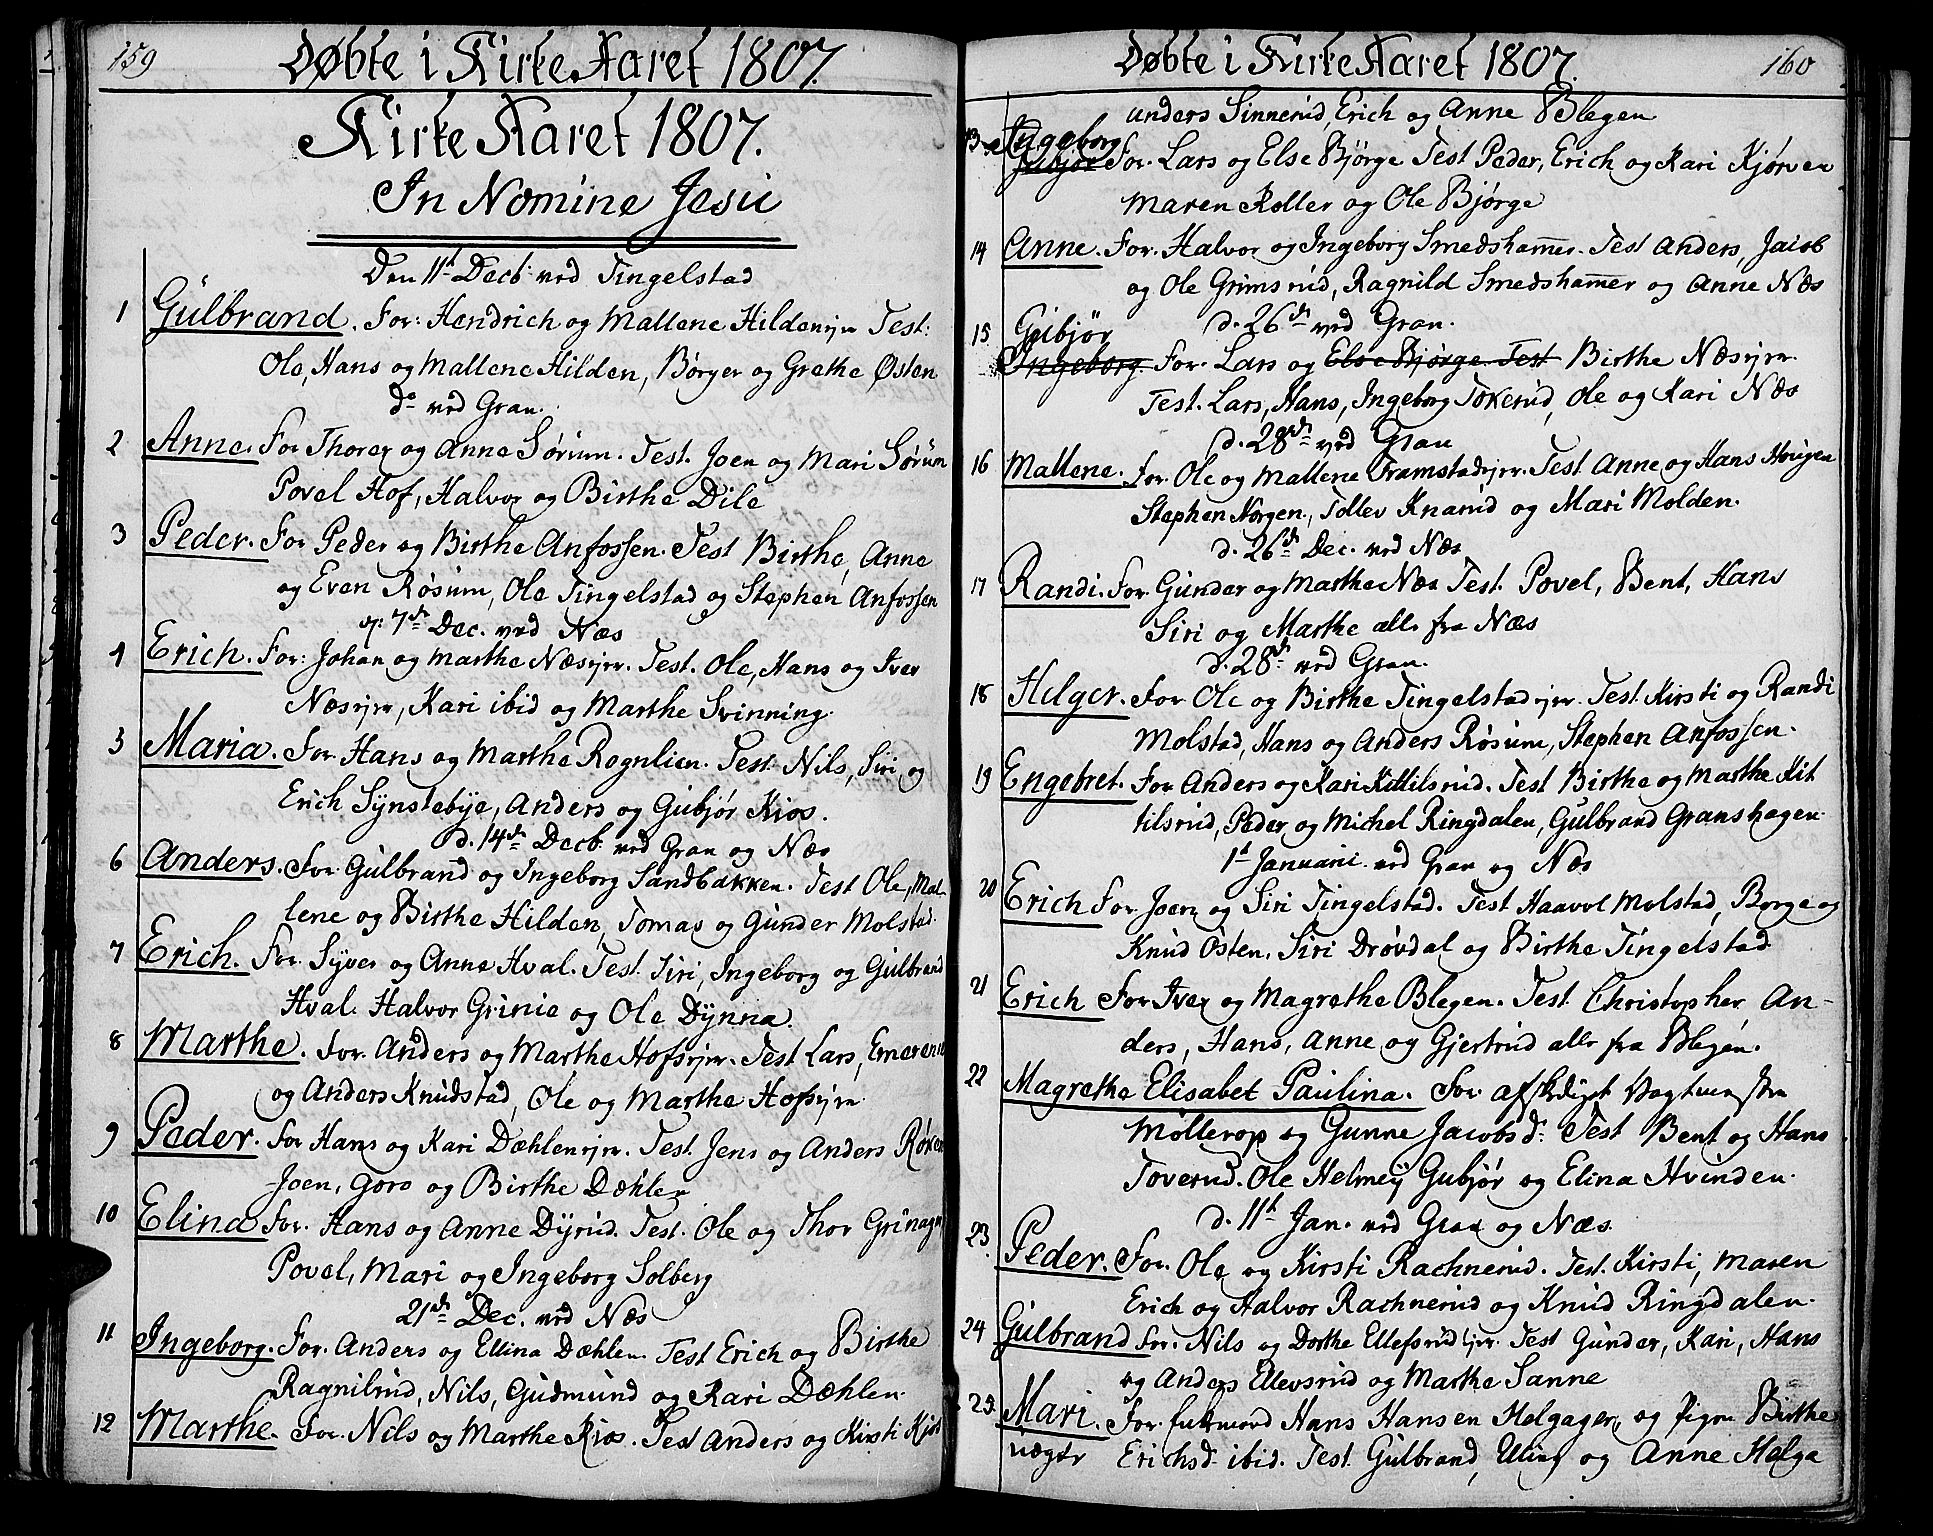 SAH, Gran prestekontor, Ministerialbok nr. 8, 1798-1811, s. 159-160